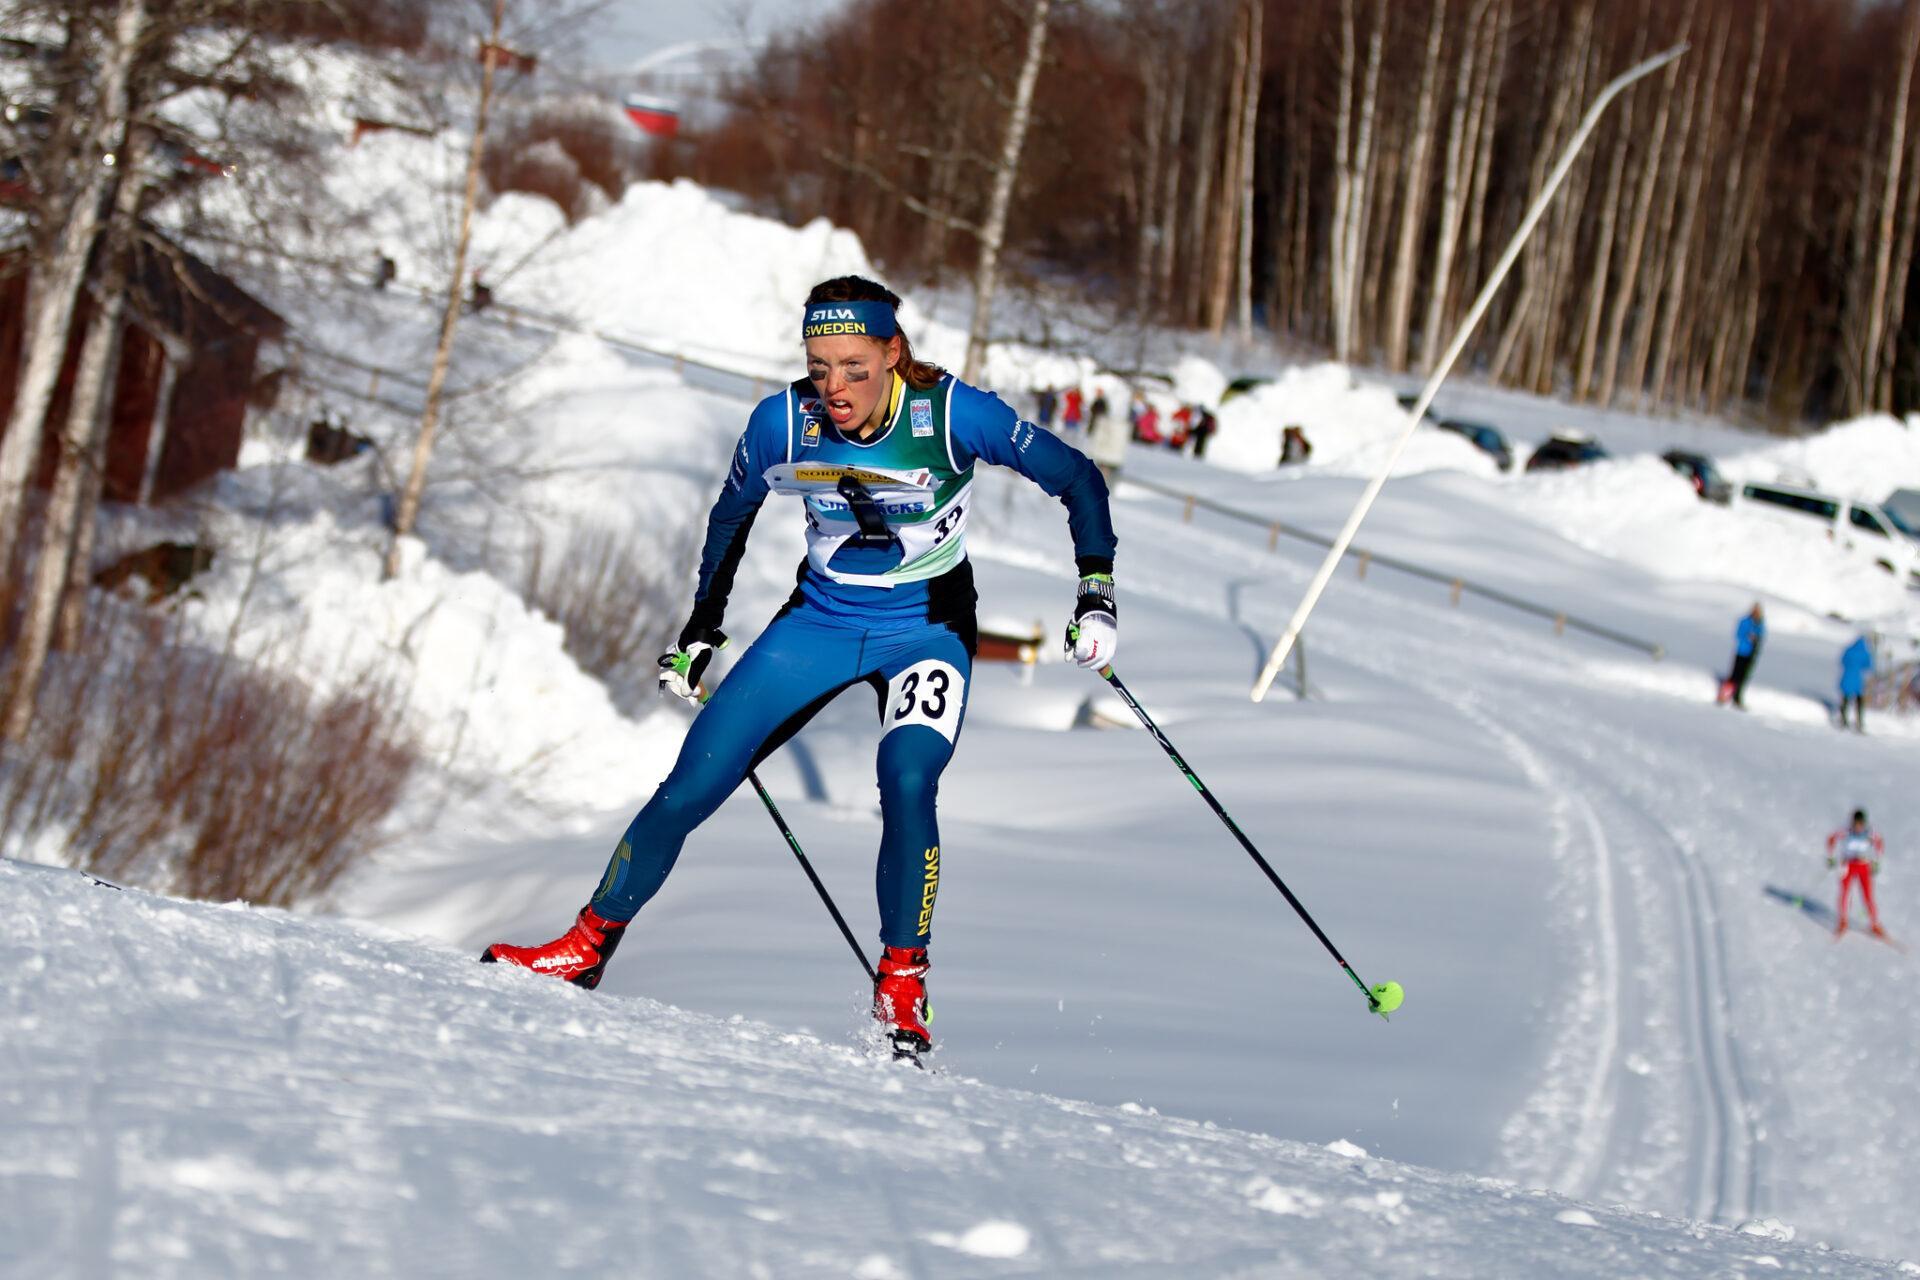 Tove Alexandersson skiing.